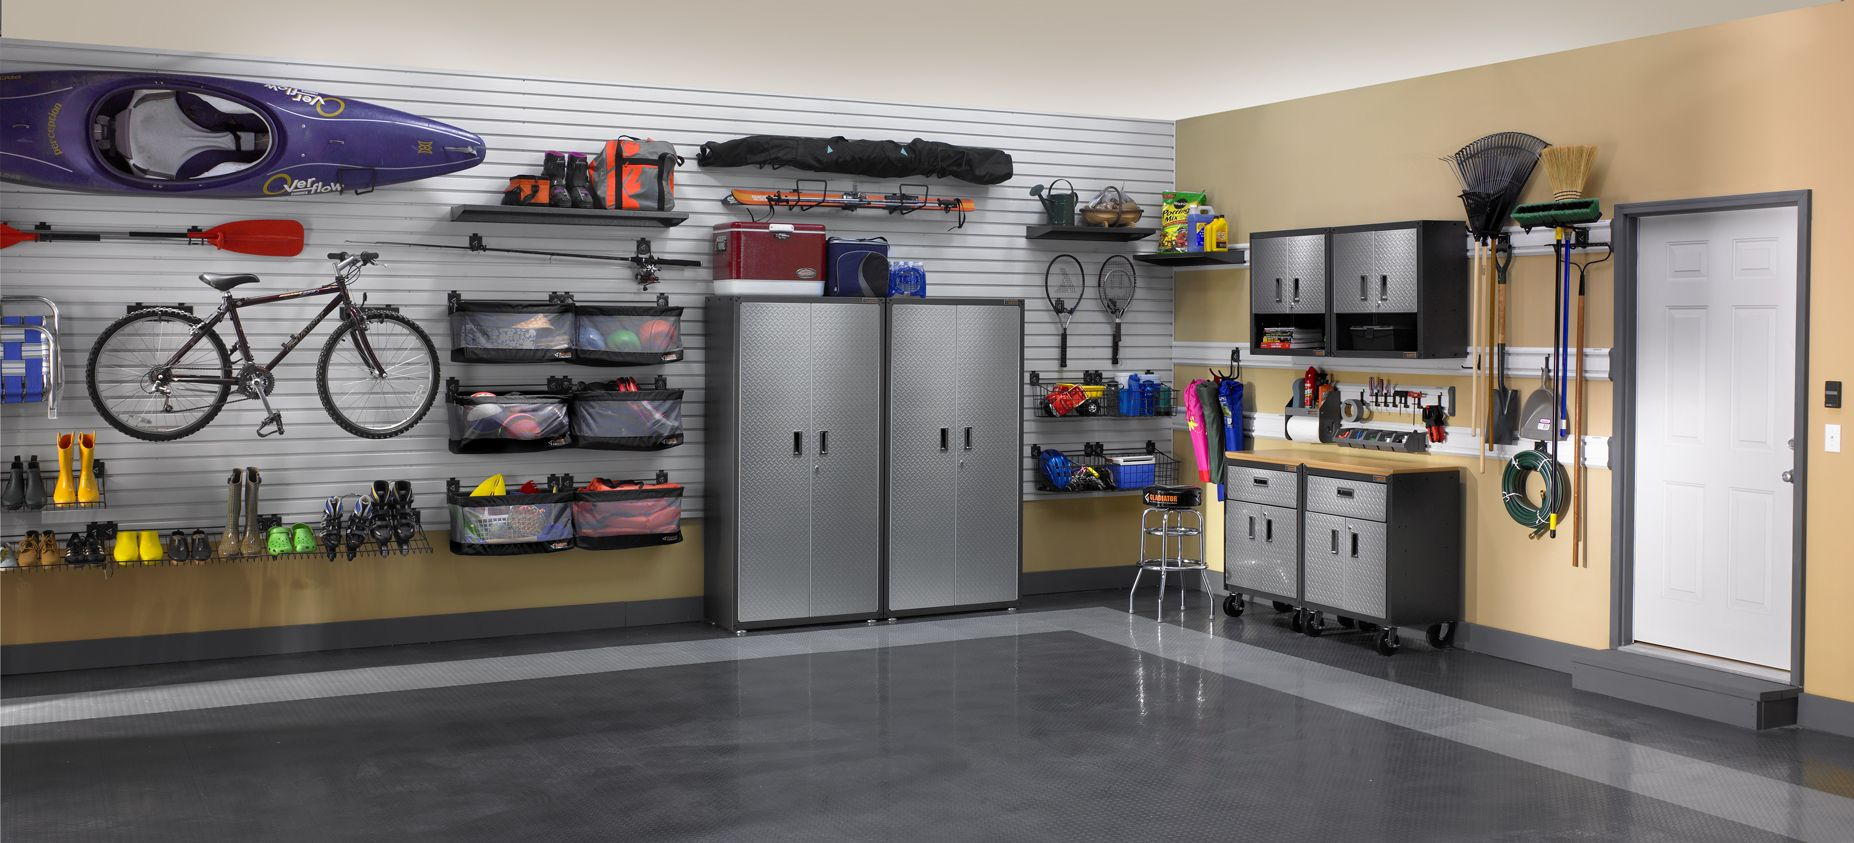 gladiator garageworks storage, organization, flooring, and more